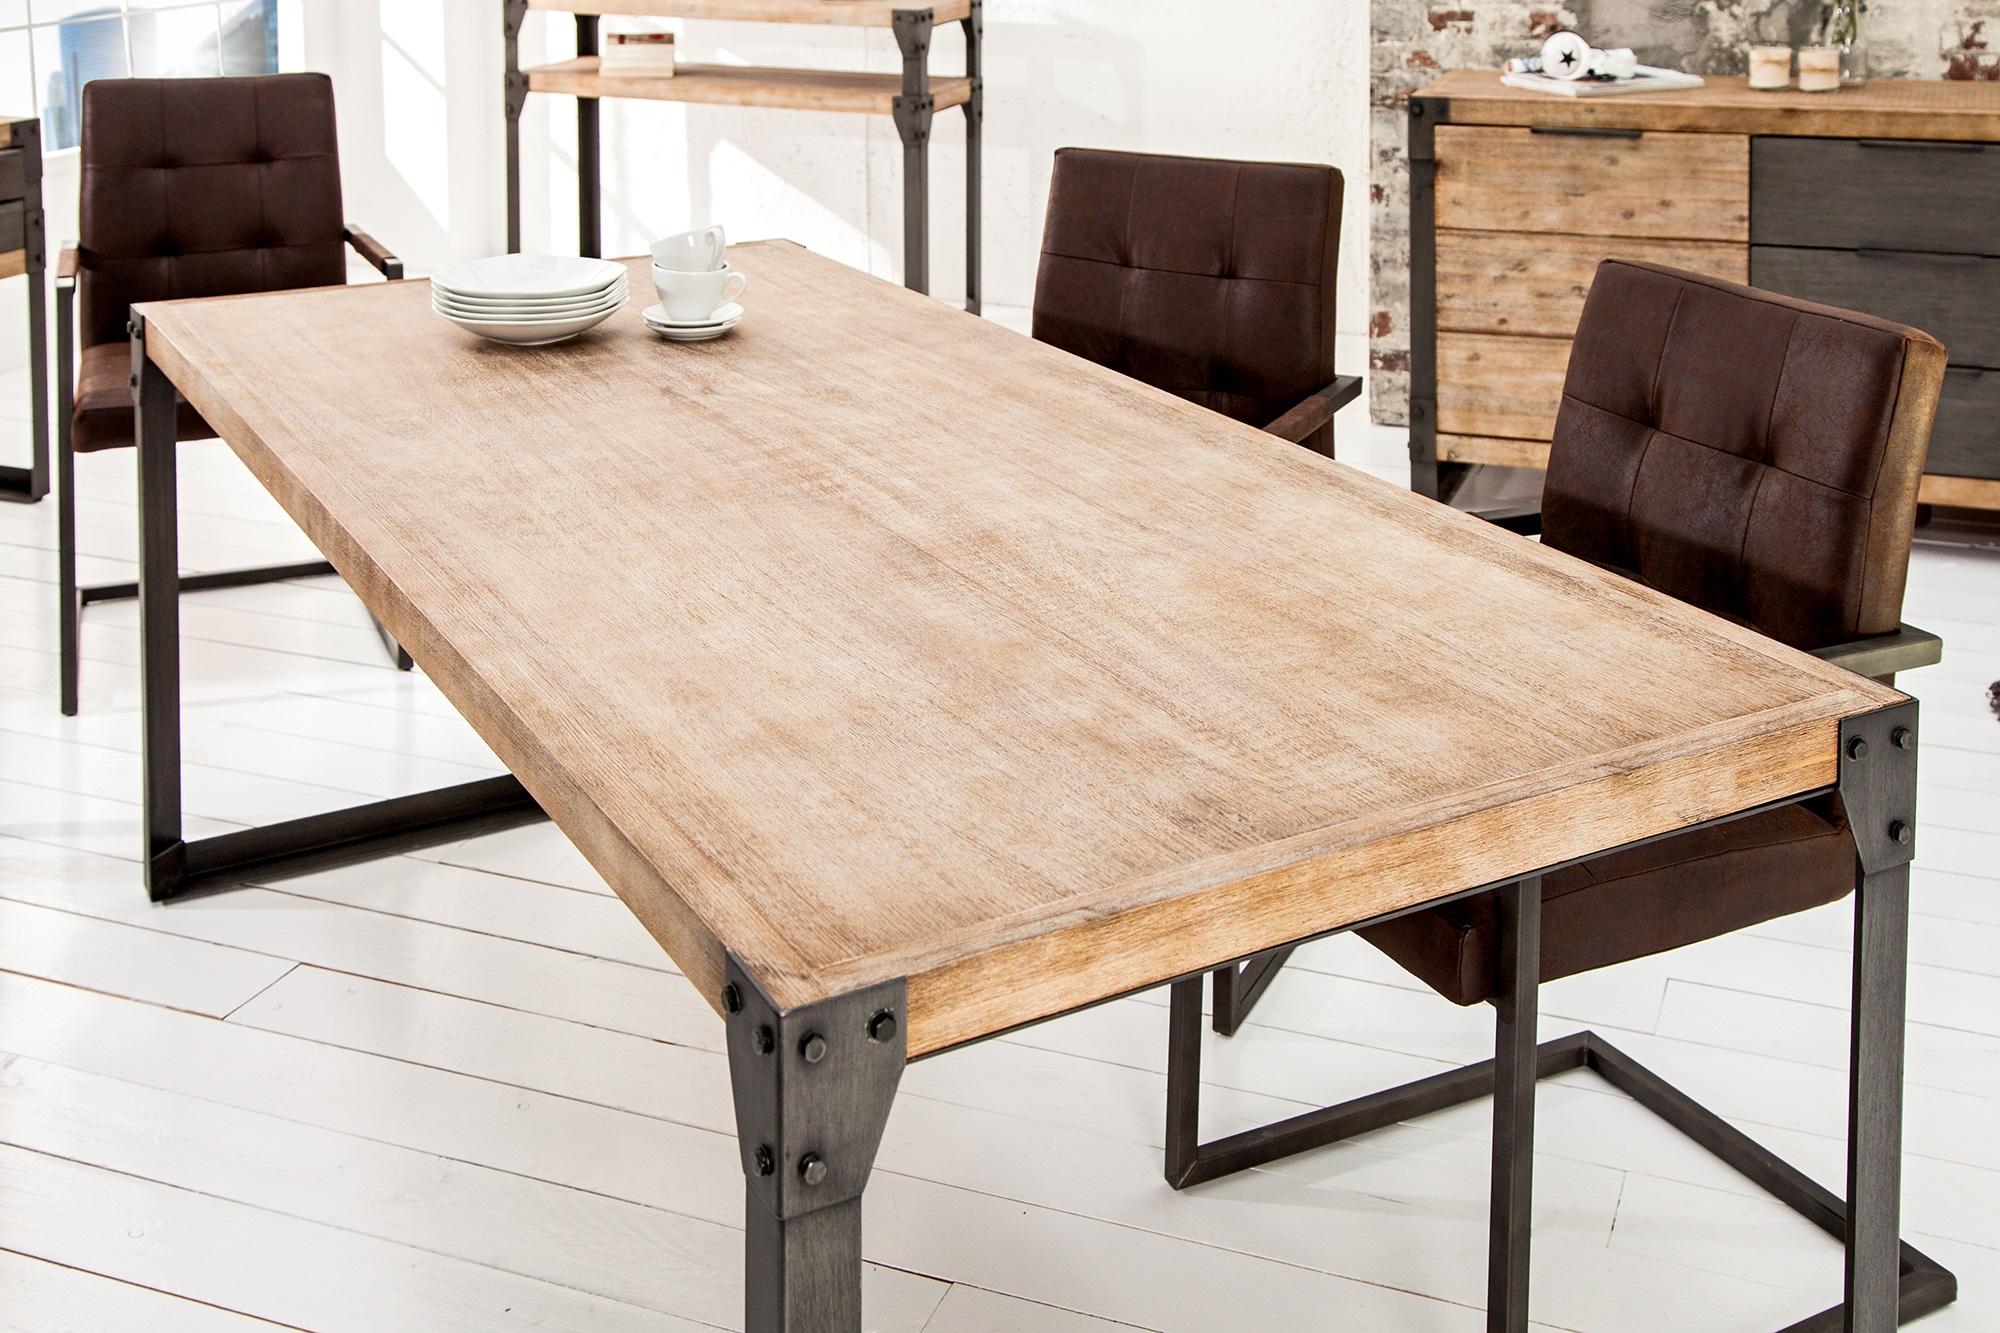 Eetafel hout cm meubeldeals